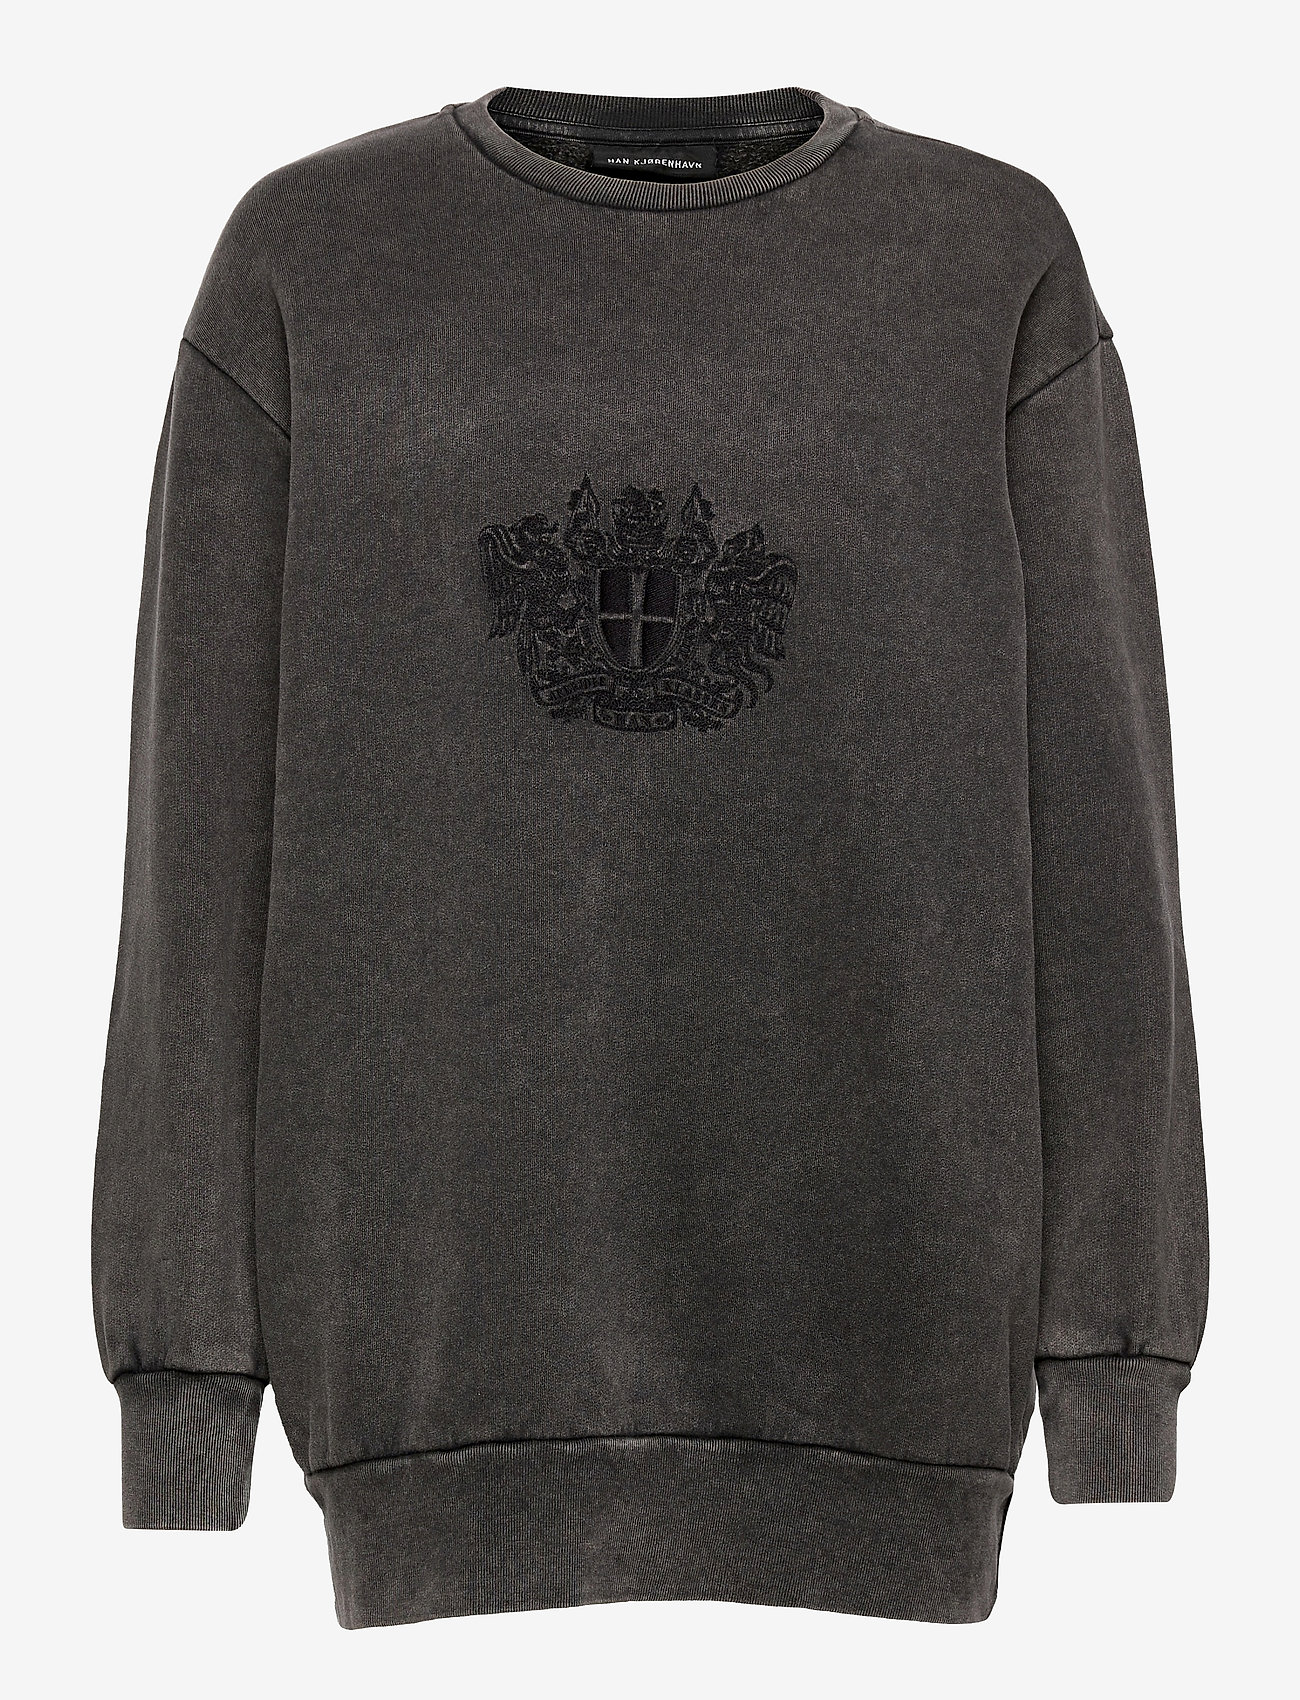 HAN Kjøbenhavn - Relaxed Crew - sweatshirts - faded dark grey - 0